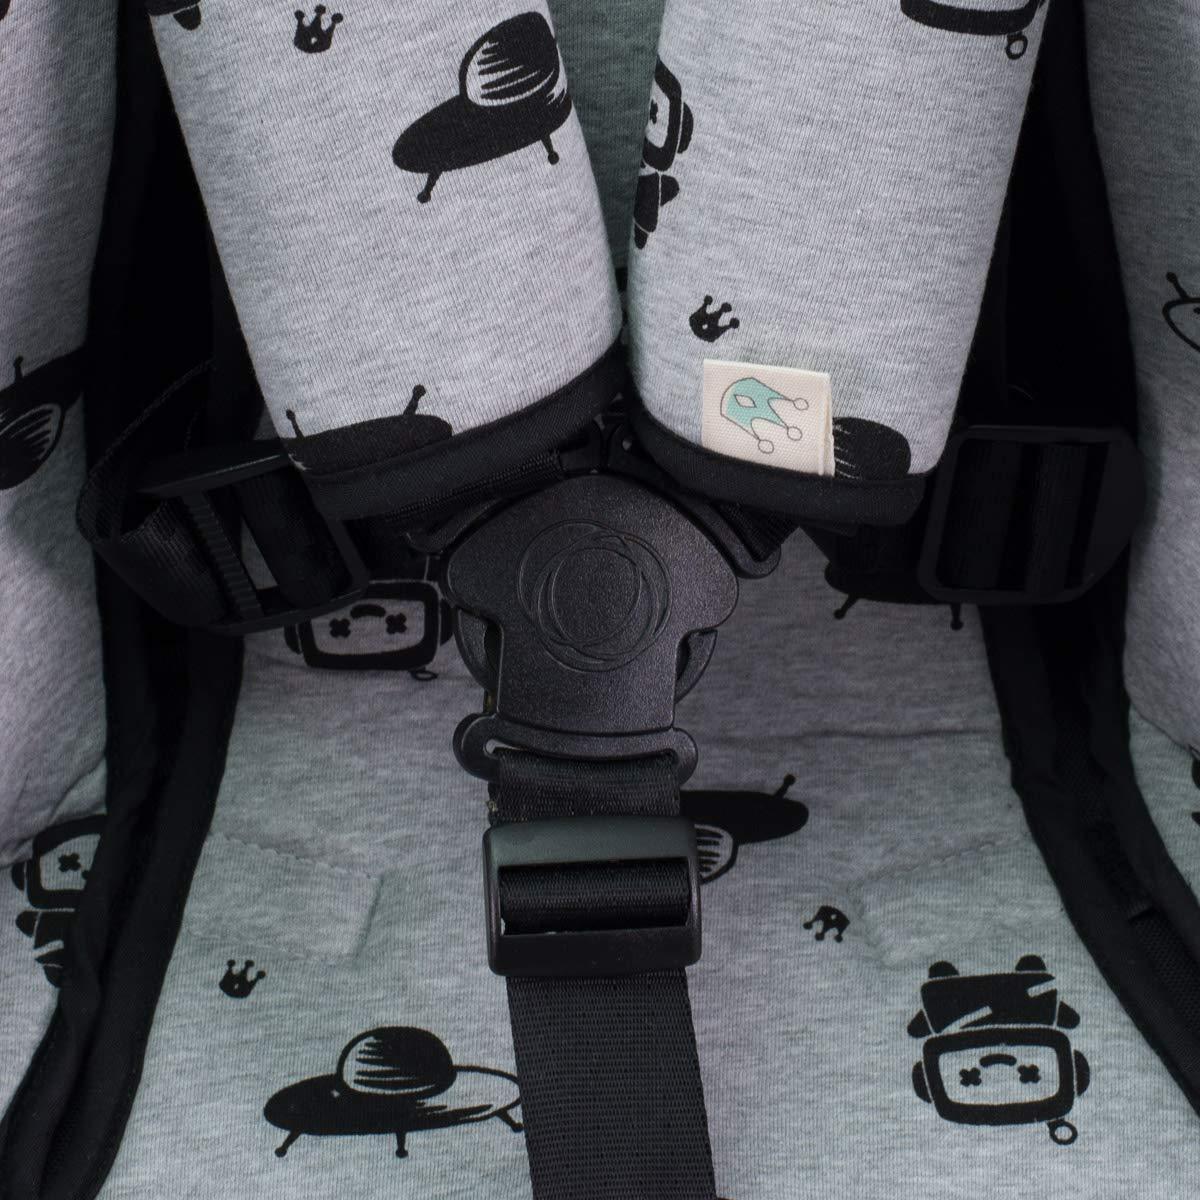 Inglesina, Cibex, Bugaboo,.. Crabby Universal Cover Pushchair Luxury Foam Protection Harnesses Janabebe/®